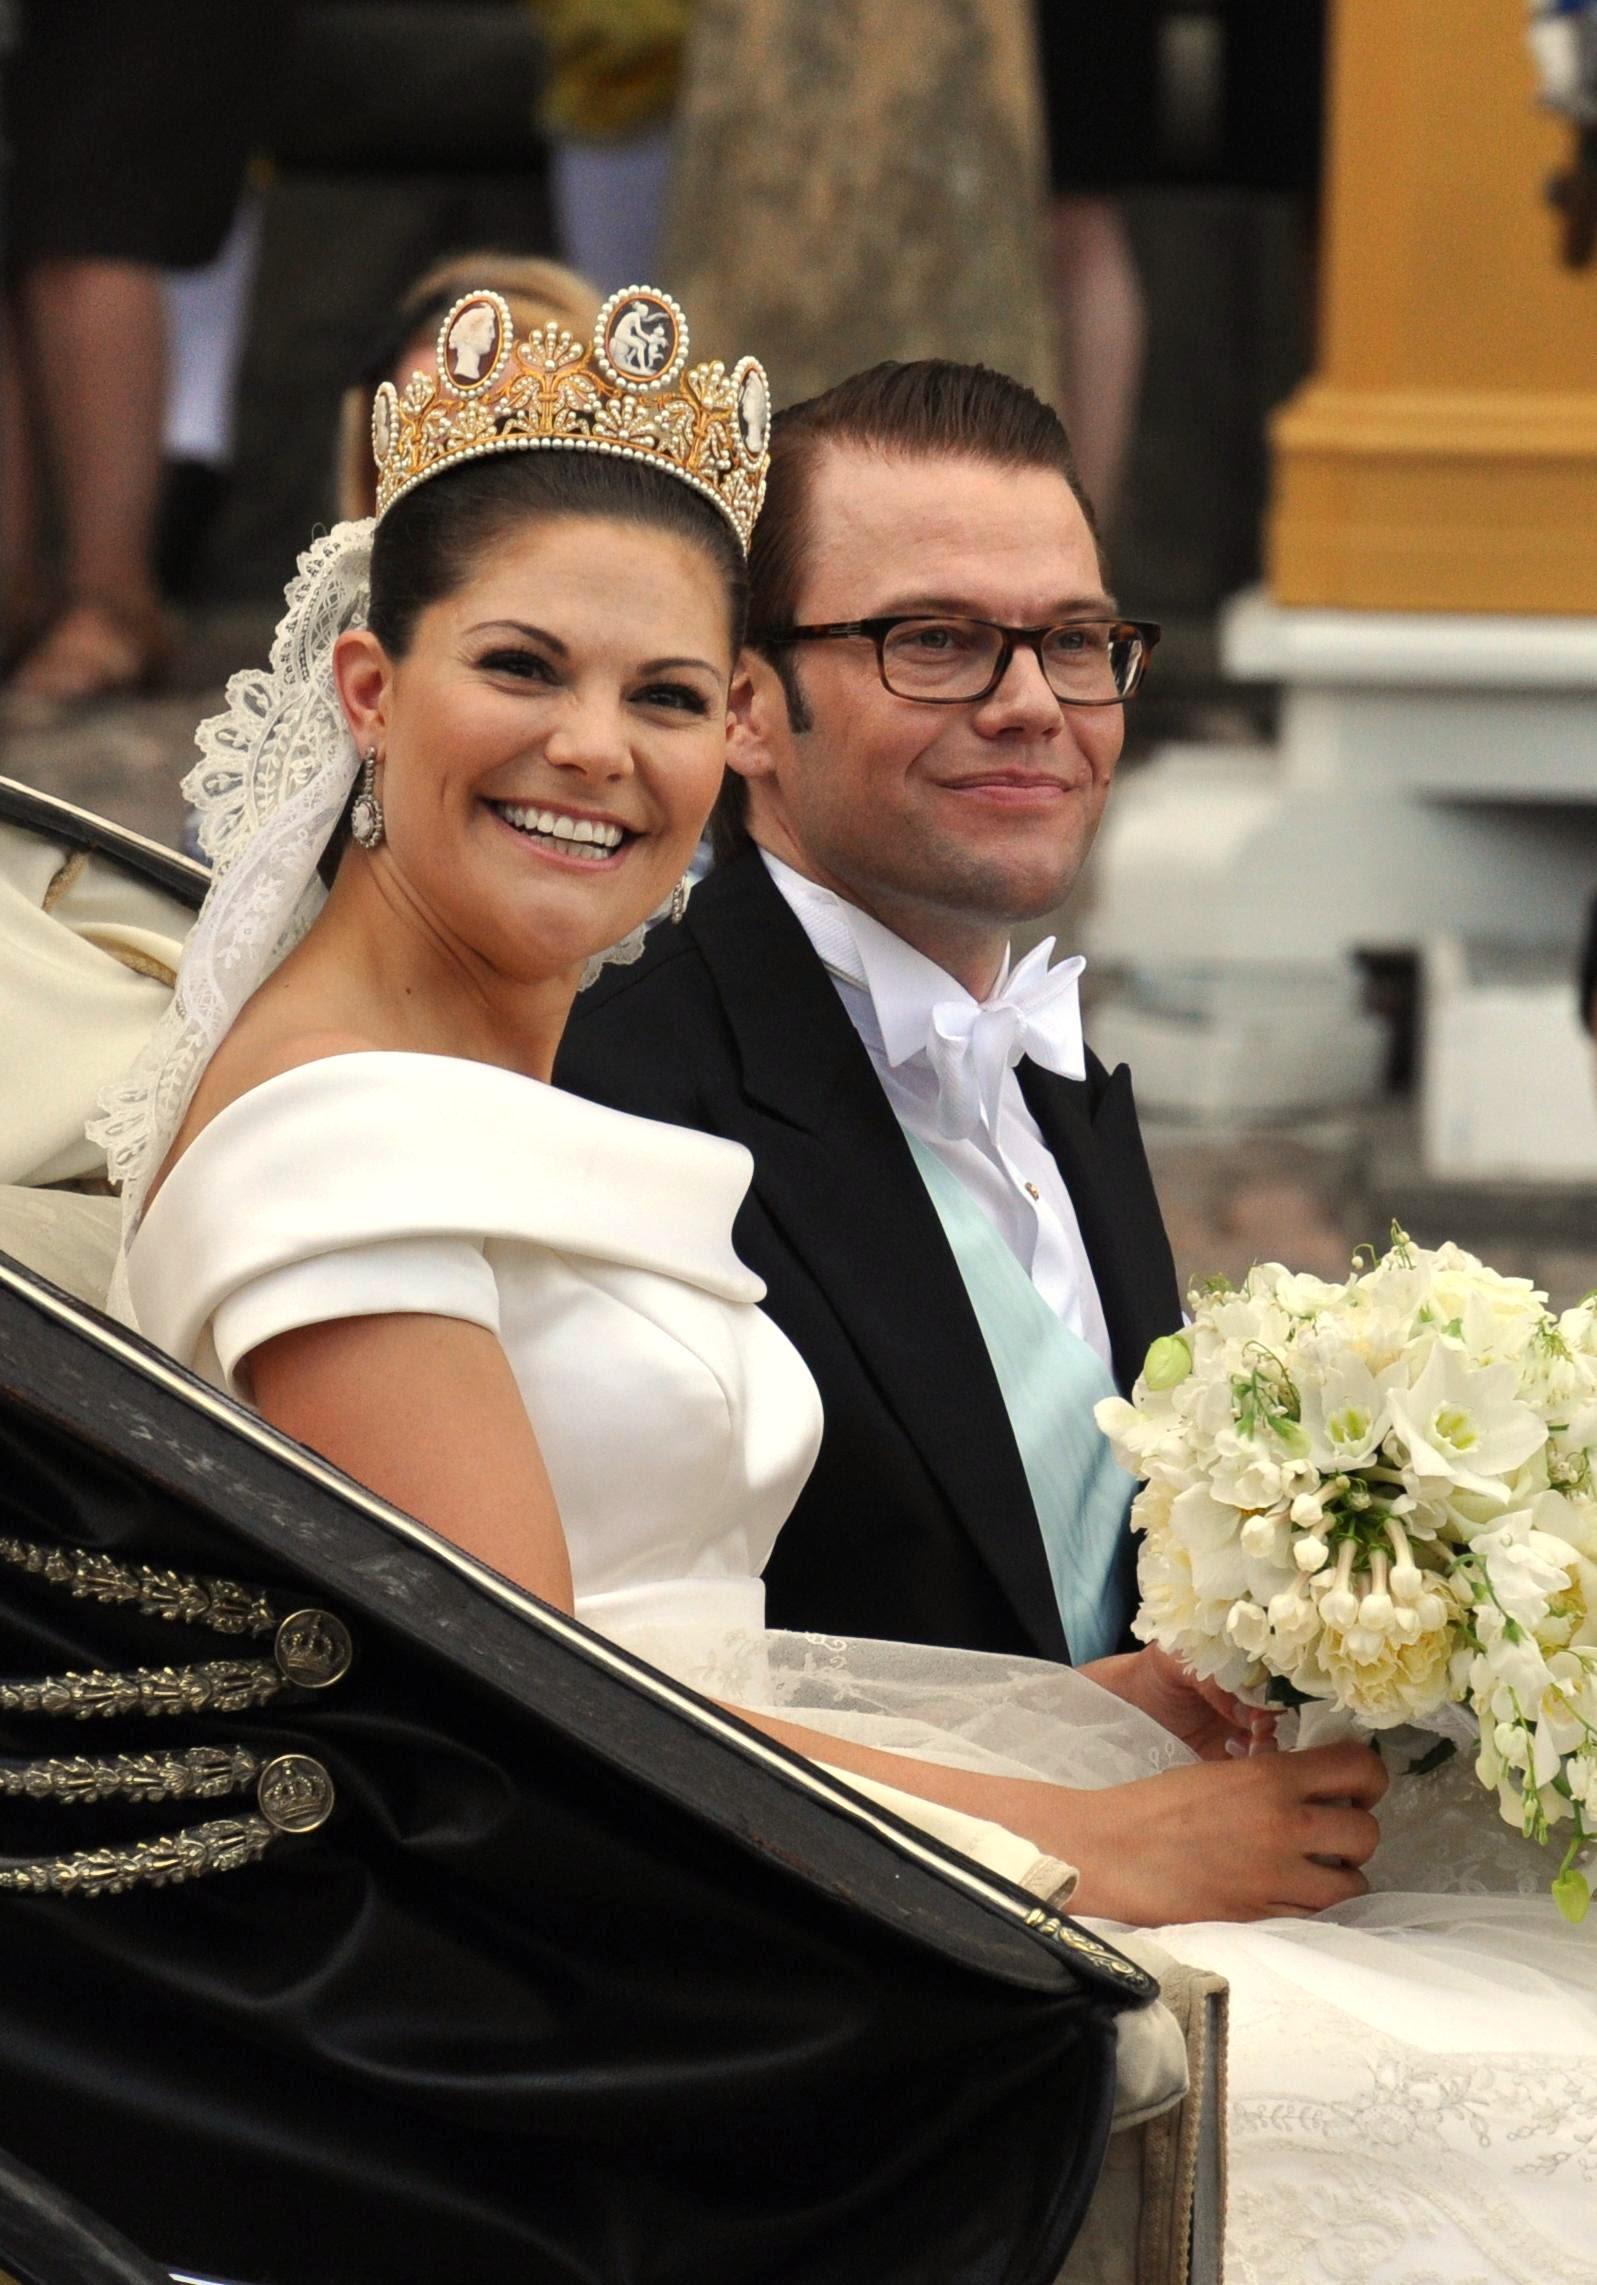 Wedding of Victoria, Crown Princess of Sweden, and Daniel Westling; Cortège at Slottsbacken